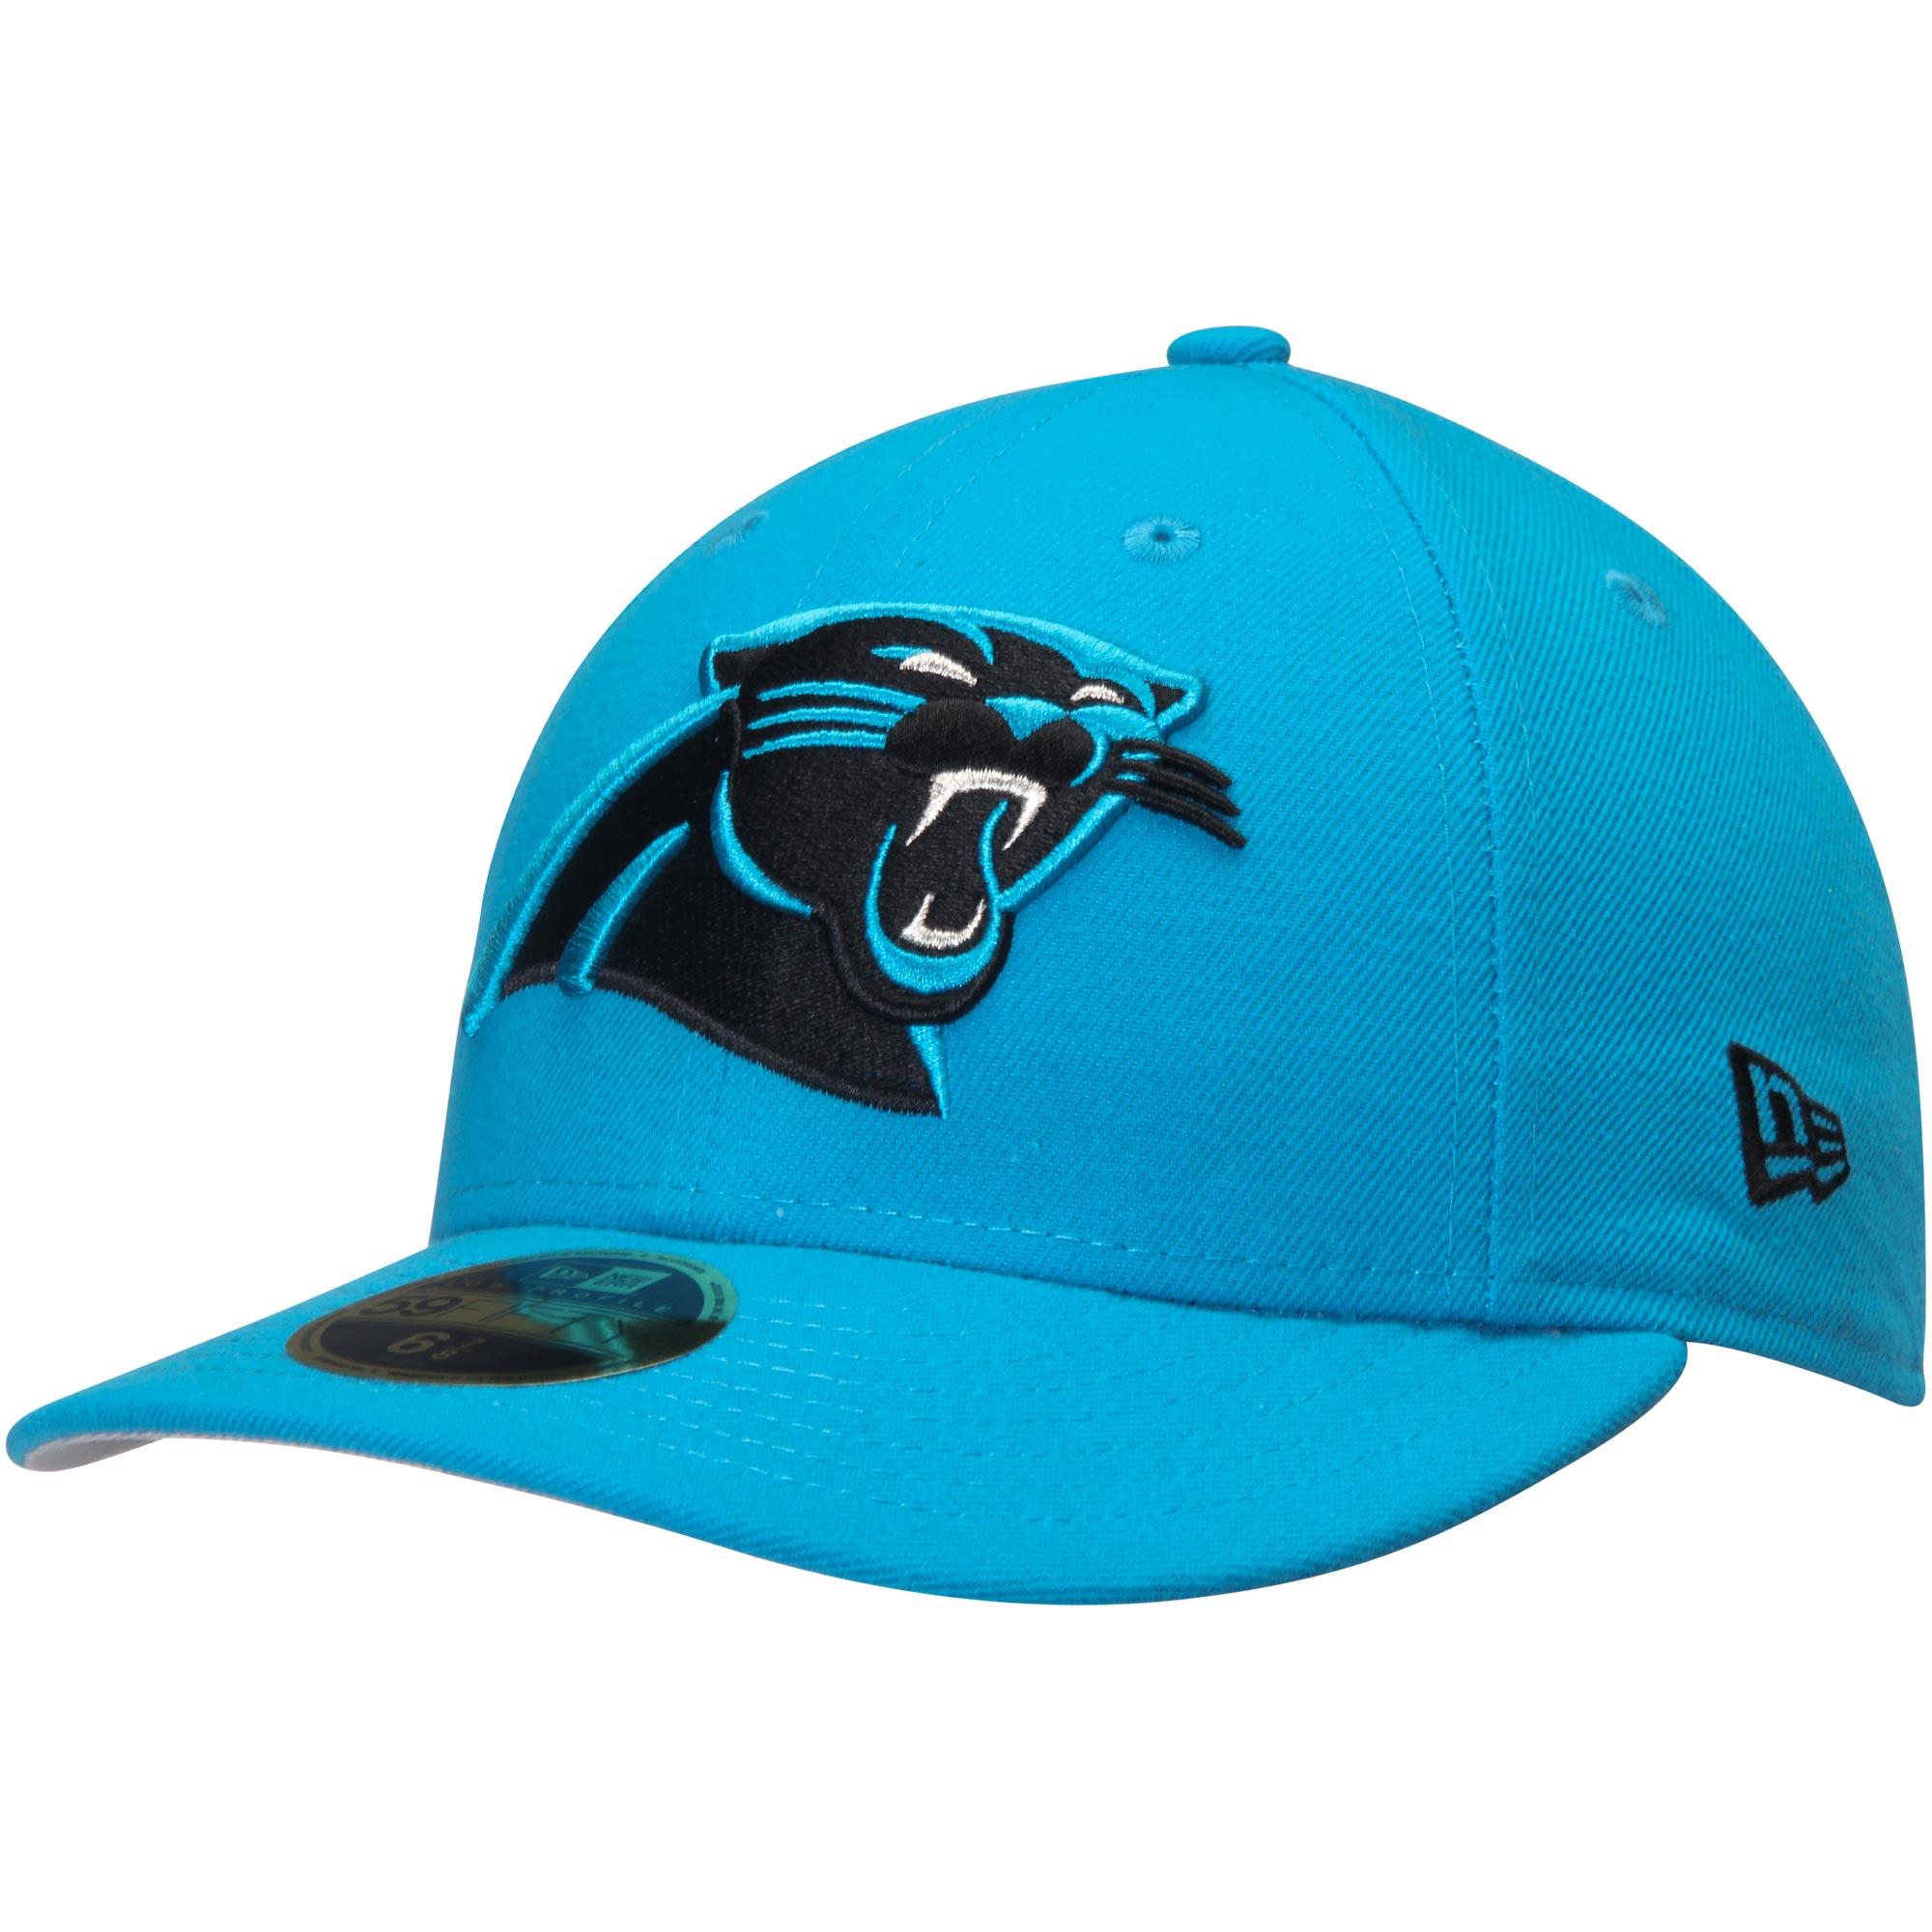 Carolina Panthers New Era Omaha Low Profile 59FIFTY Structured Hat - Blue